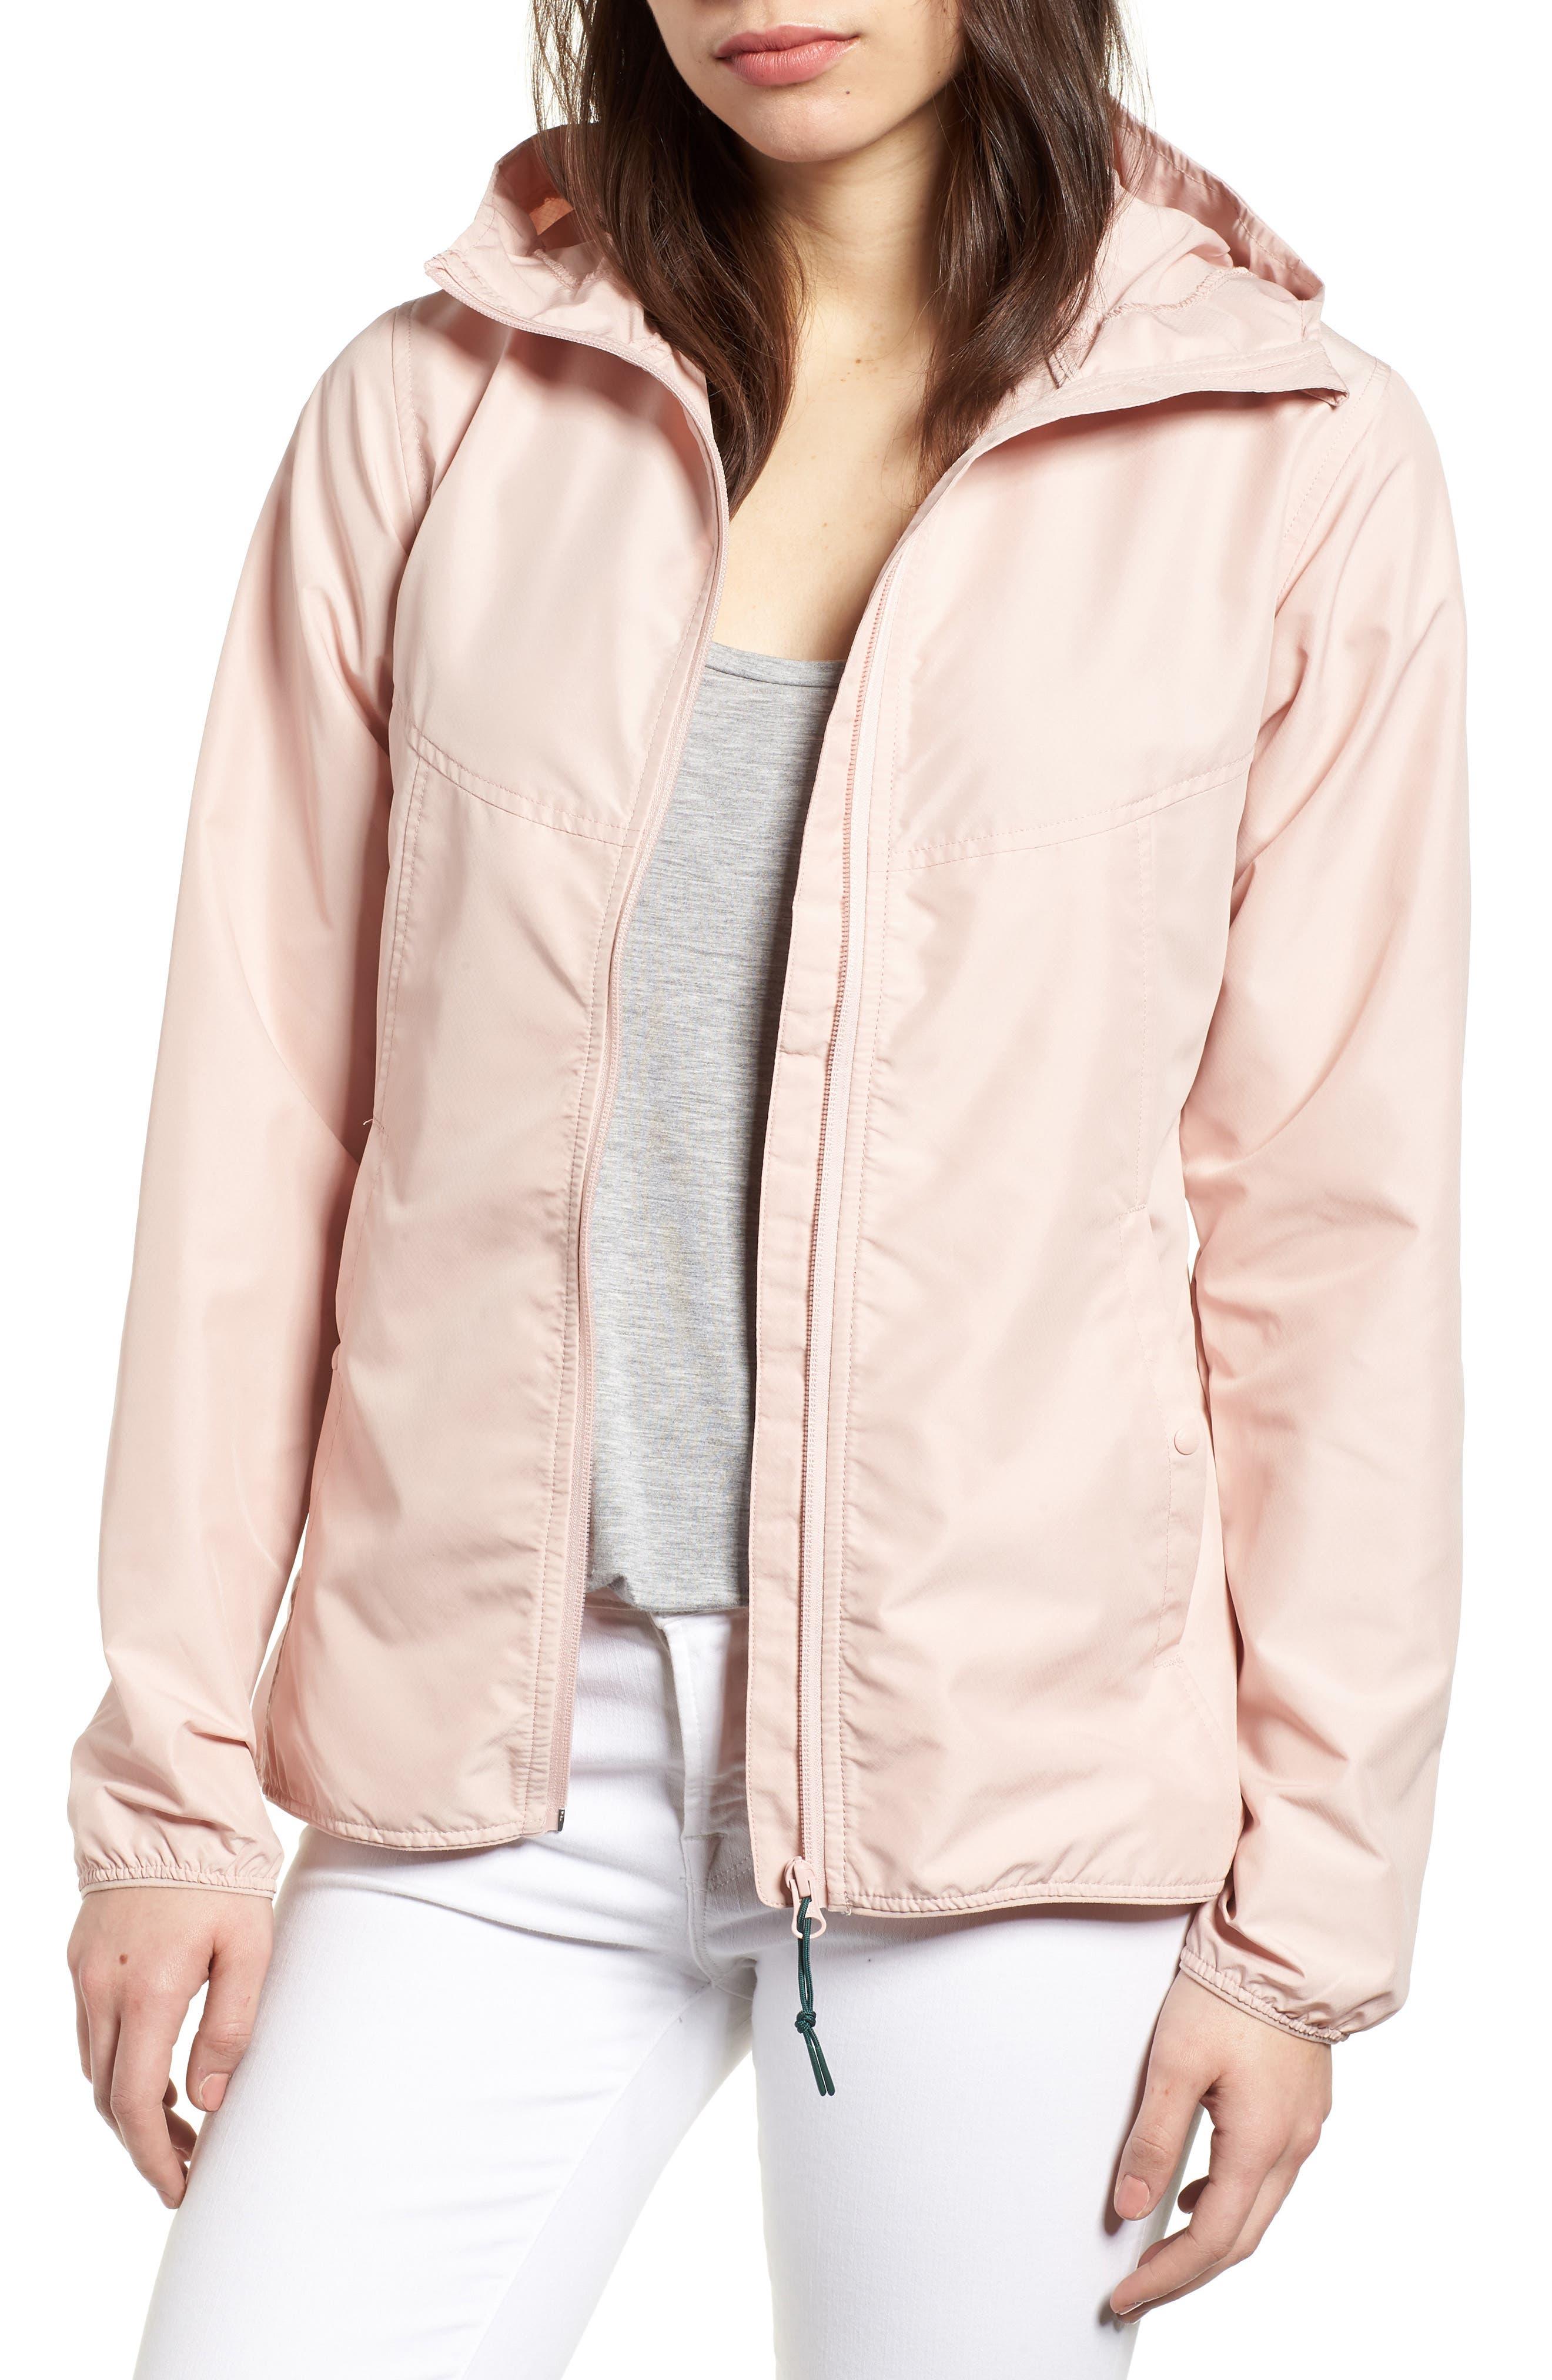 oyage Wind Hooded Jacket,                         Main,                         color, Ash Rose